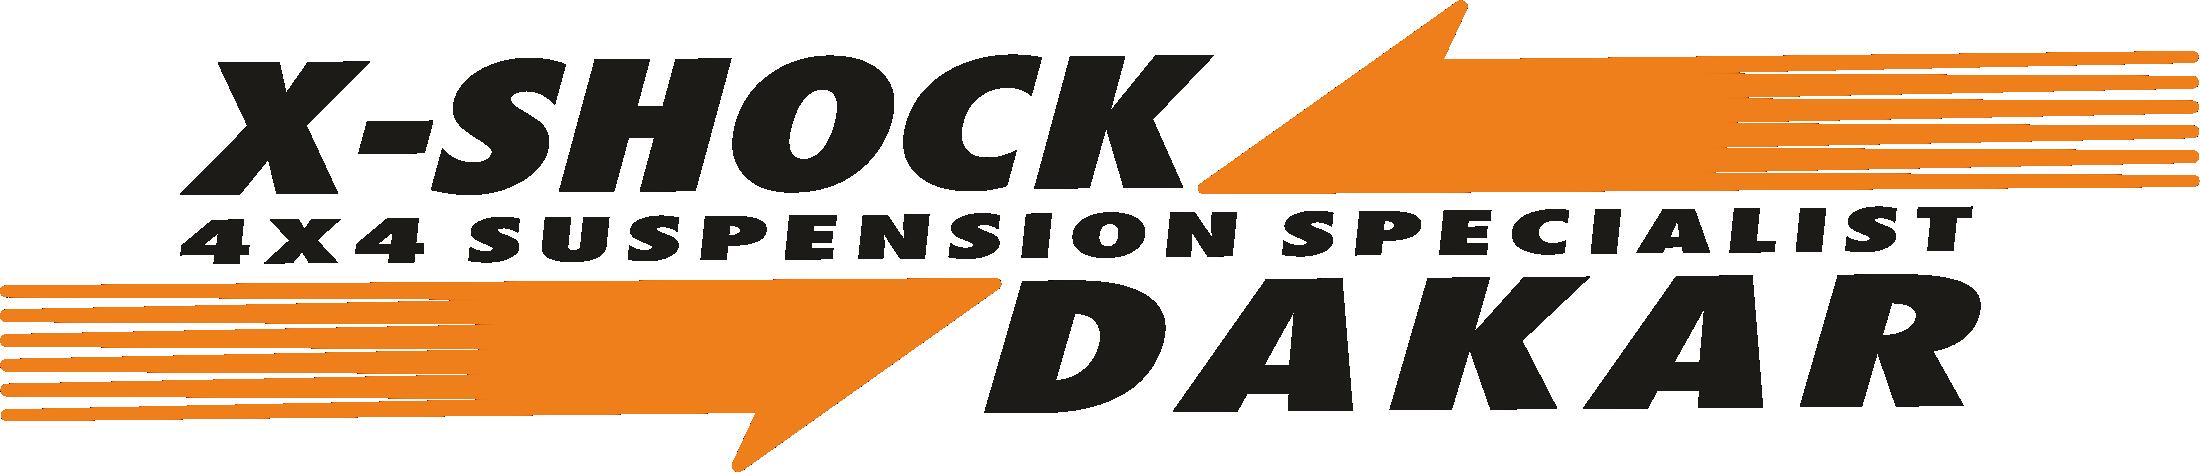 Xshock Dakar